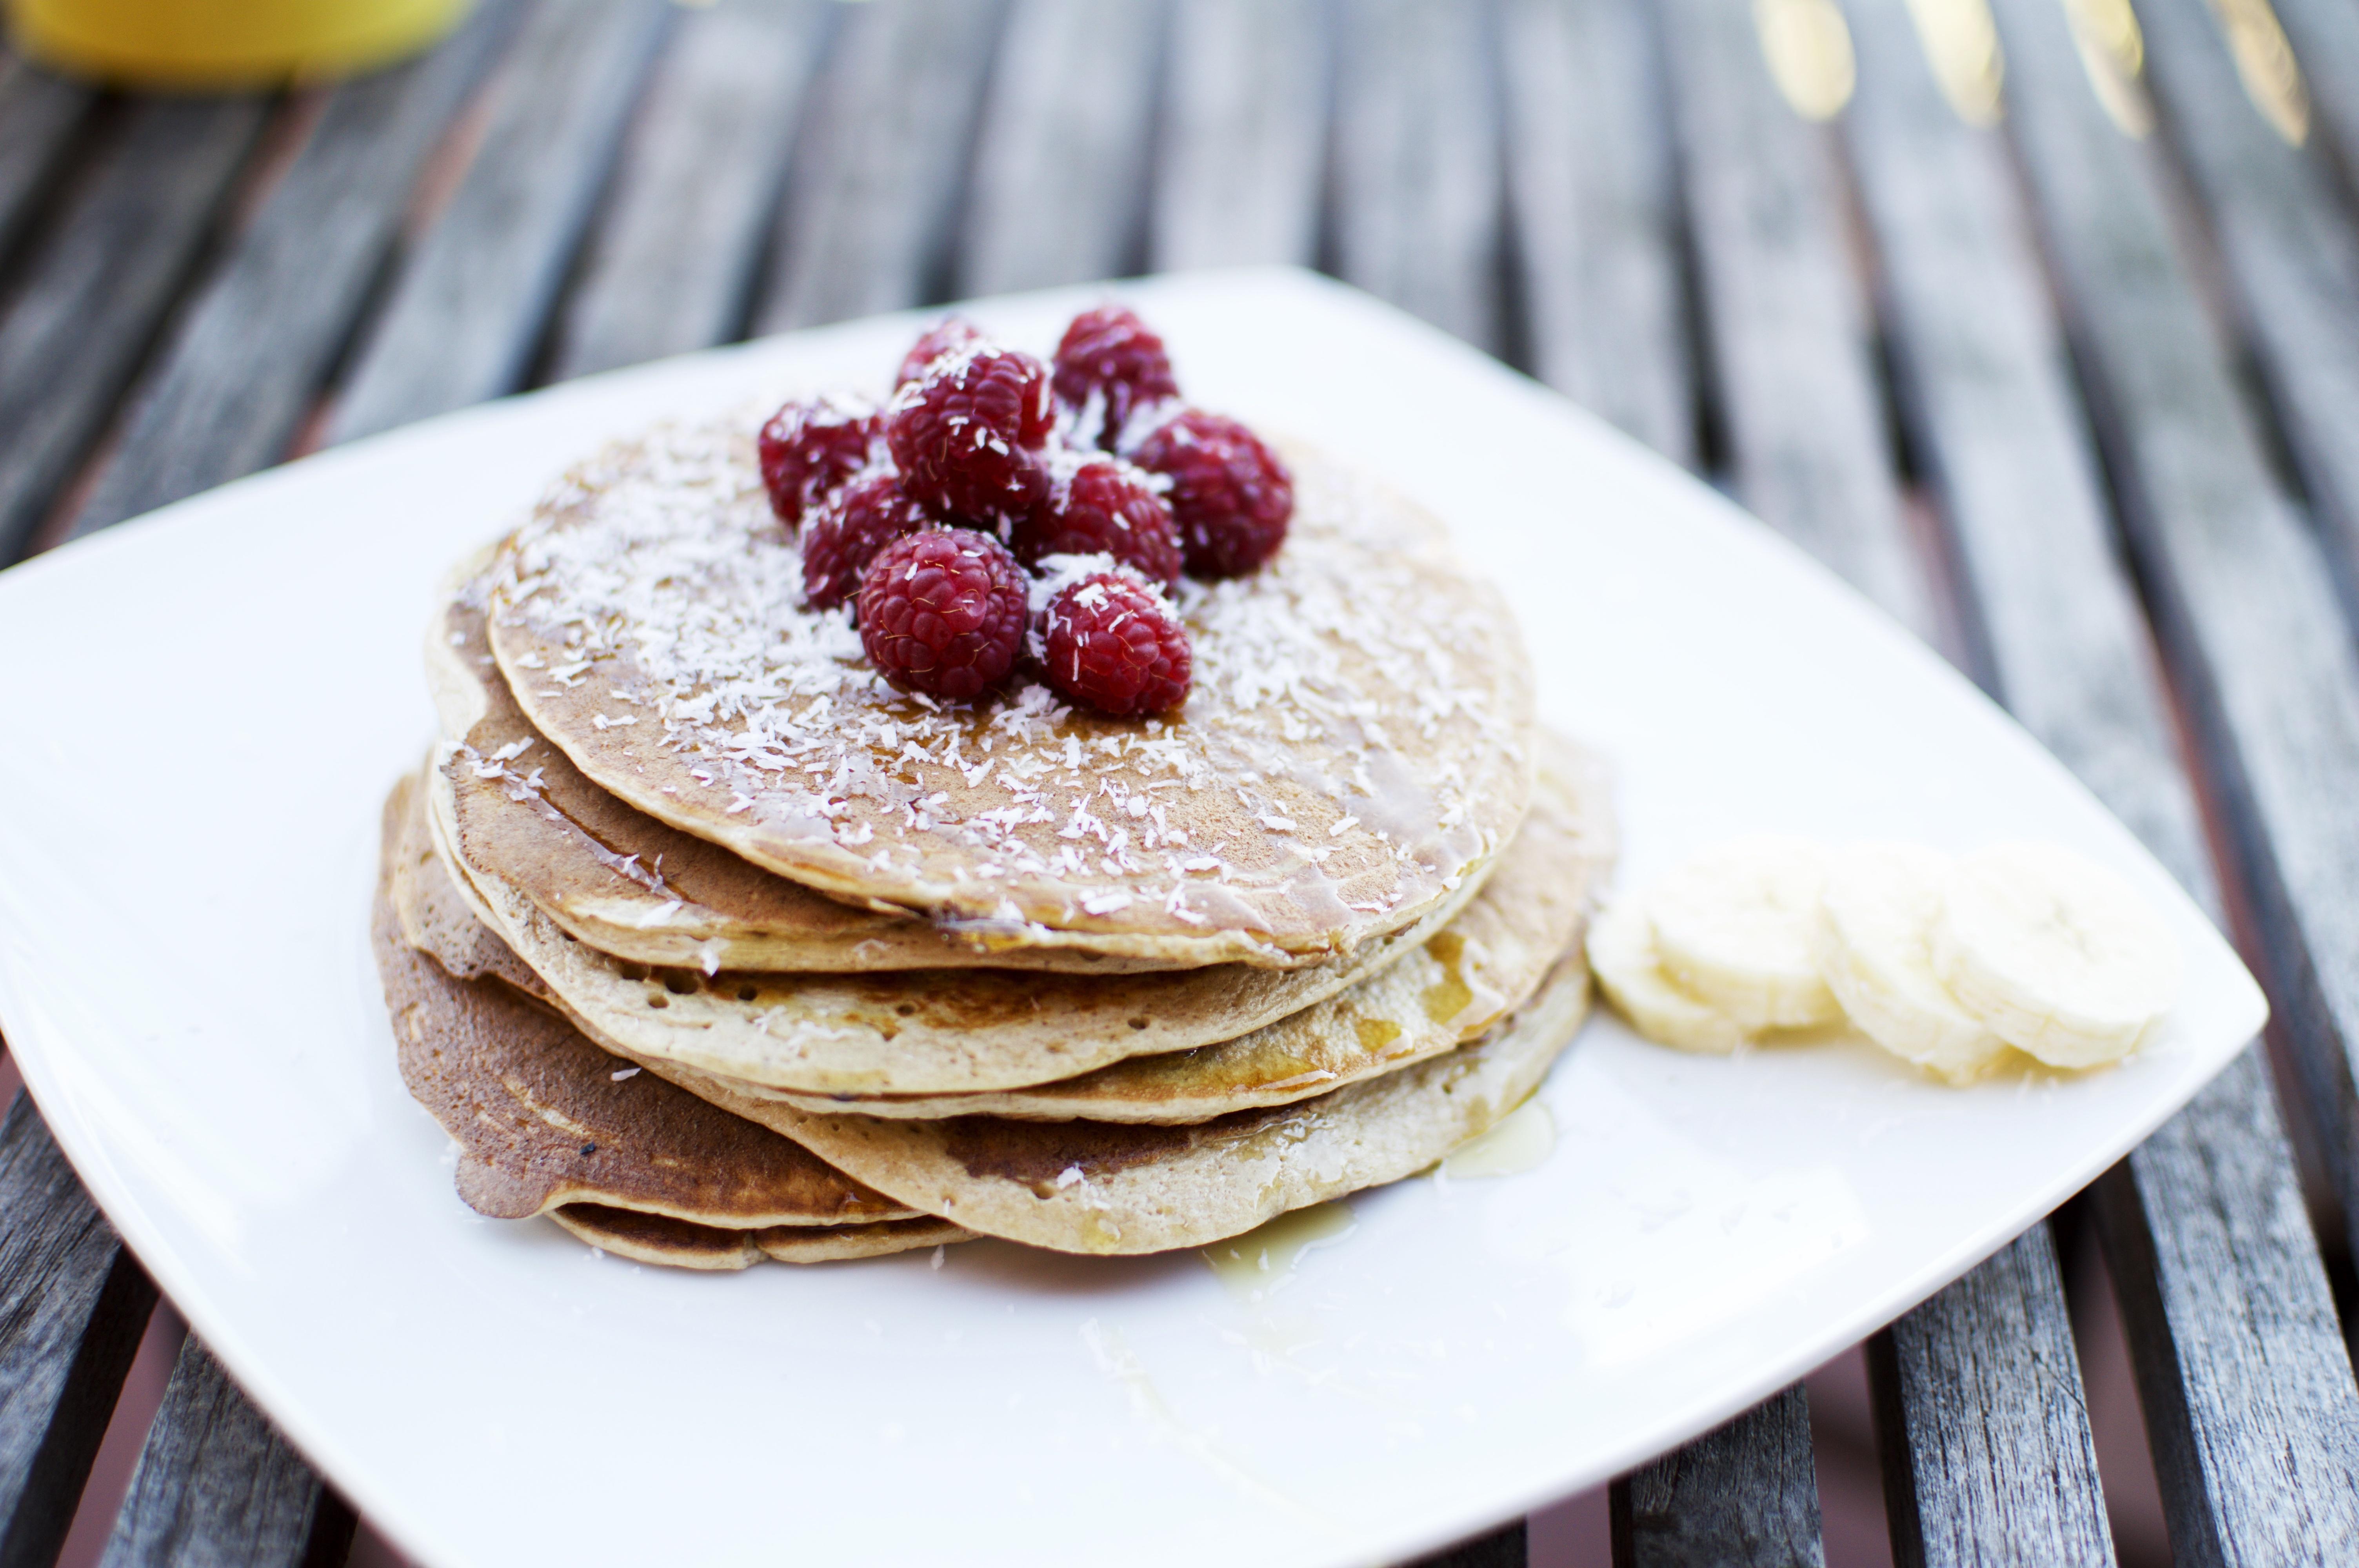 Mi desayuno FITness – My FITness breakfast